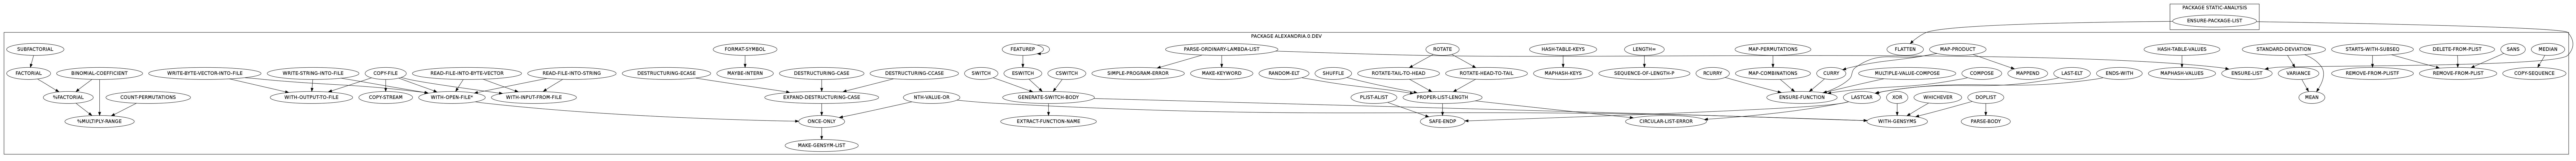 http://ryepup.unwashedmeme.com/blog/wp-content/uploads/2012/01/wpid-alexandria-graph.png